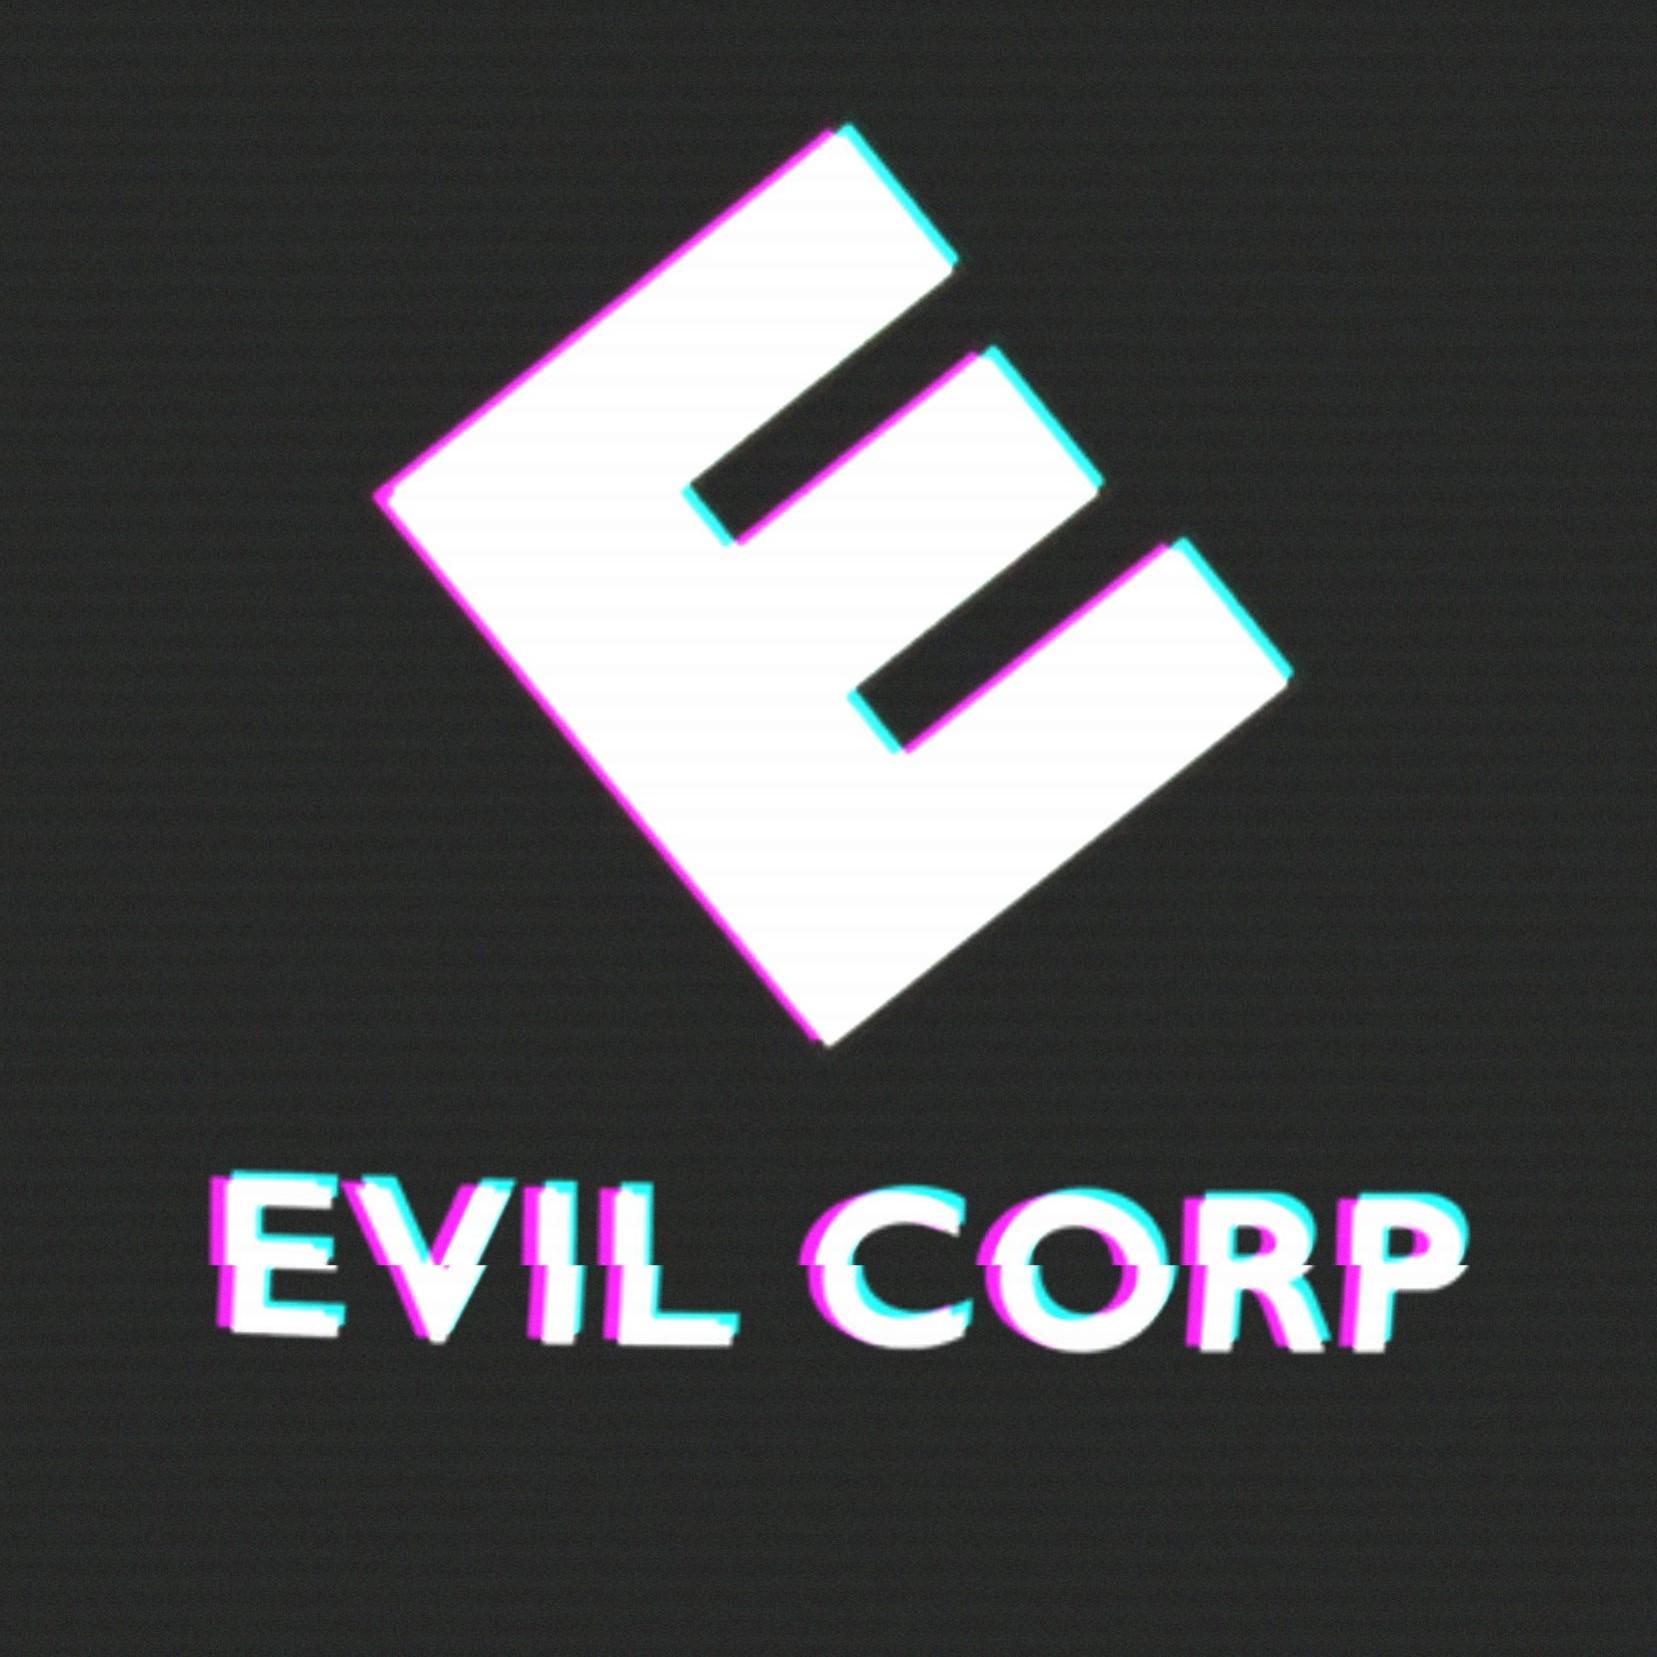 EvilCorp